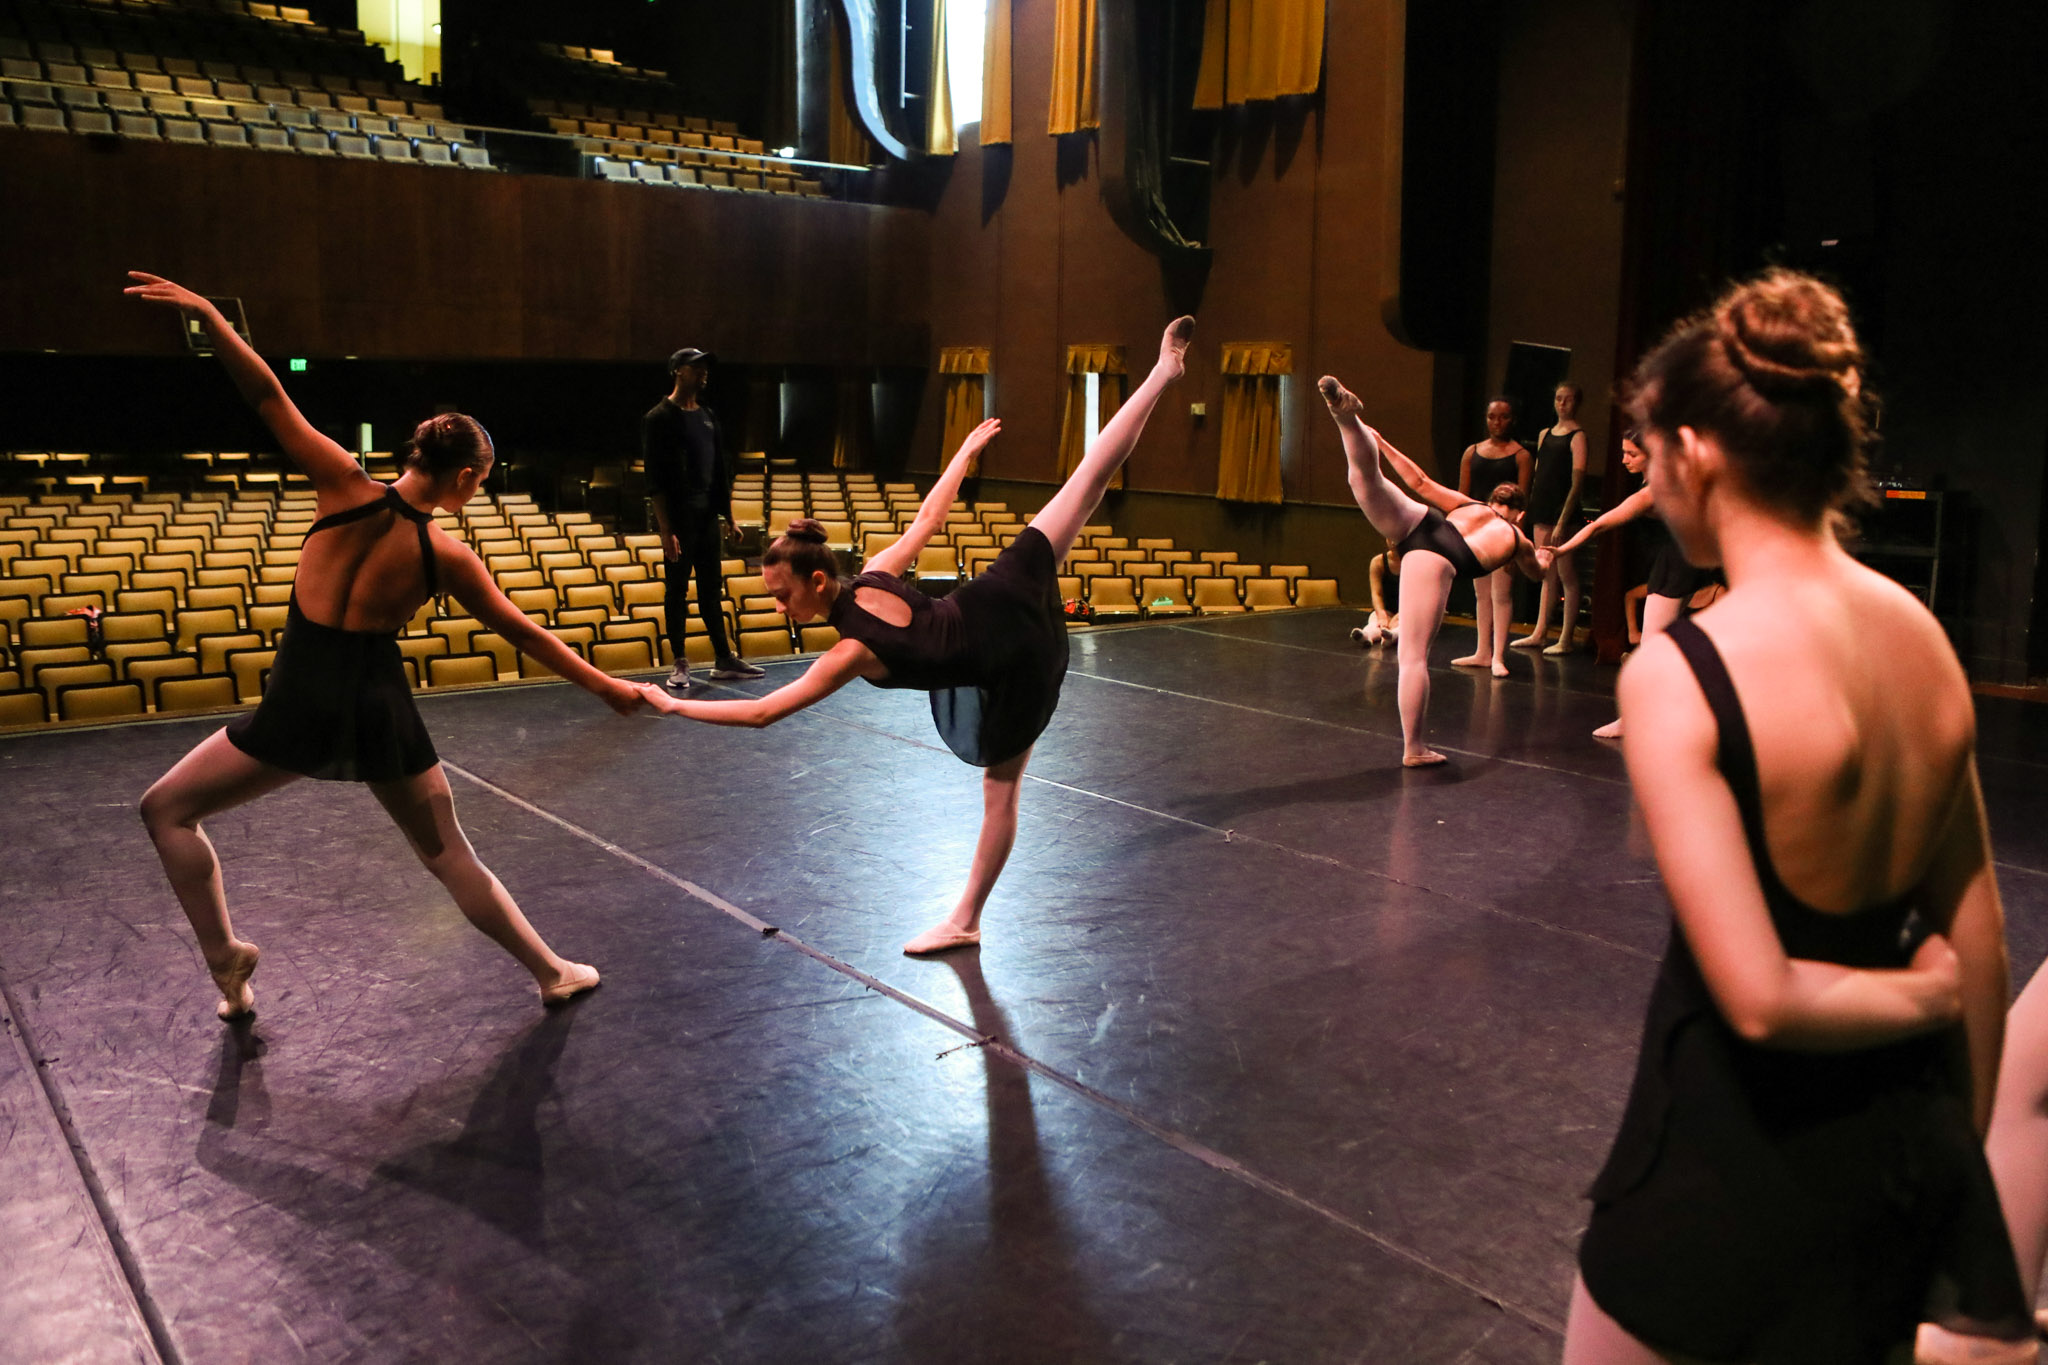 BonnieArbittier_dallas_black_dance_theater_theatre_performance_dance_dancer_dancers_recital_jo_long_caver-2.jpg